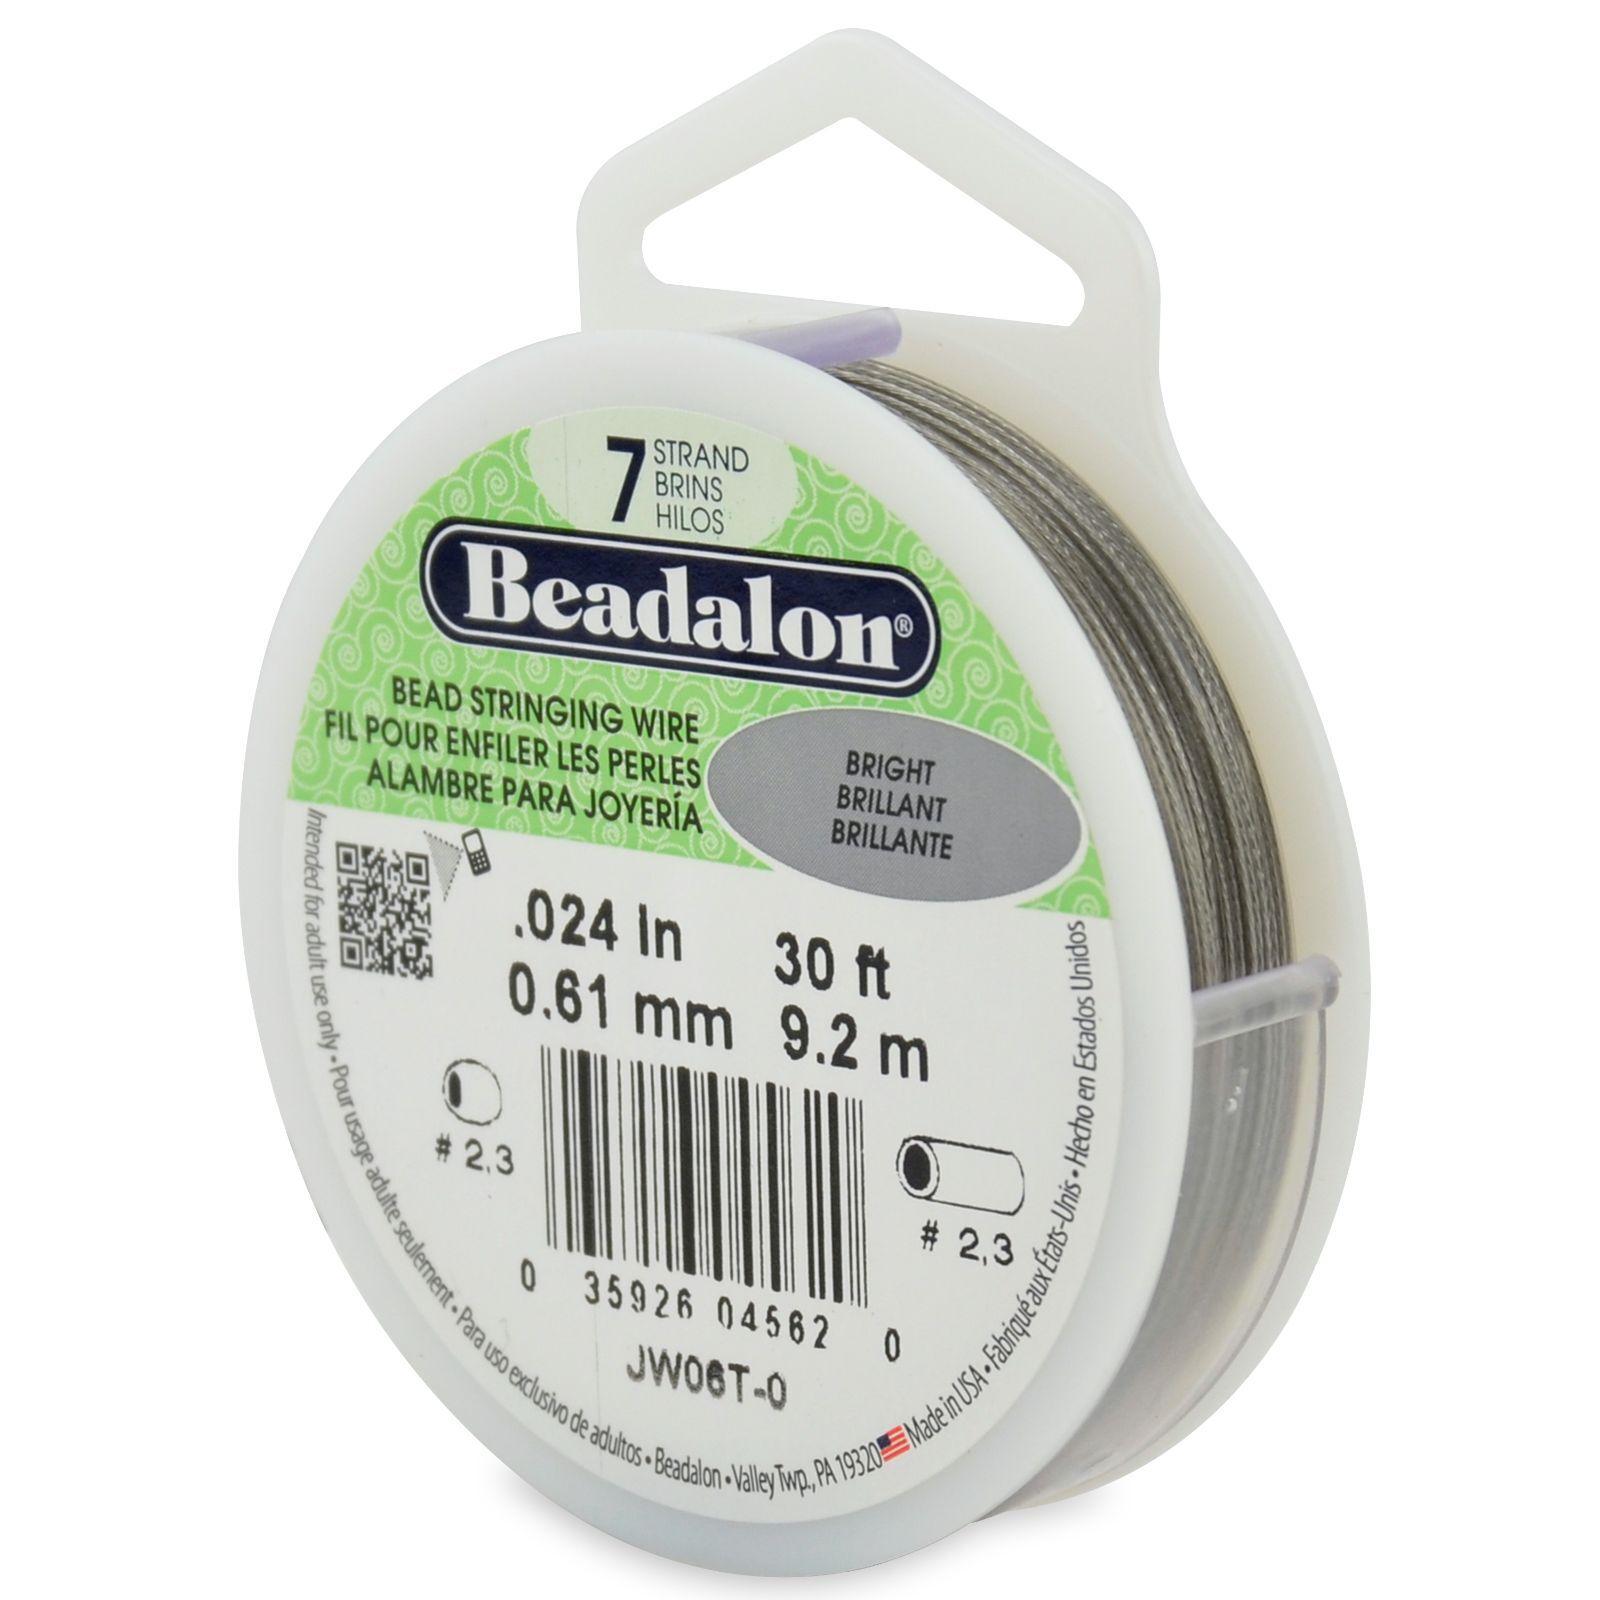 Beadalon JW03T-1 100-Feet 7-Strand Stainless Steel Bead Stringing Wire 0.018-Inch Bright